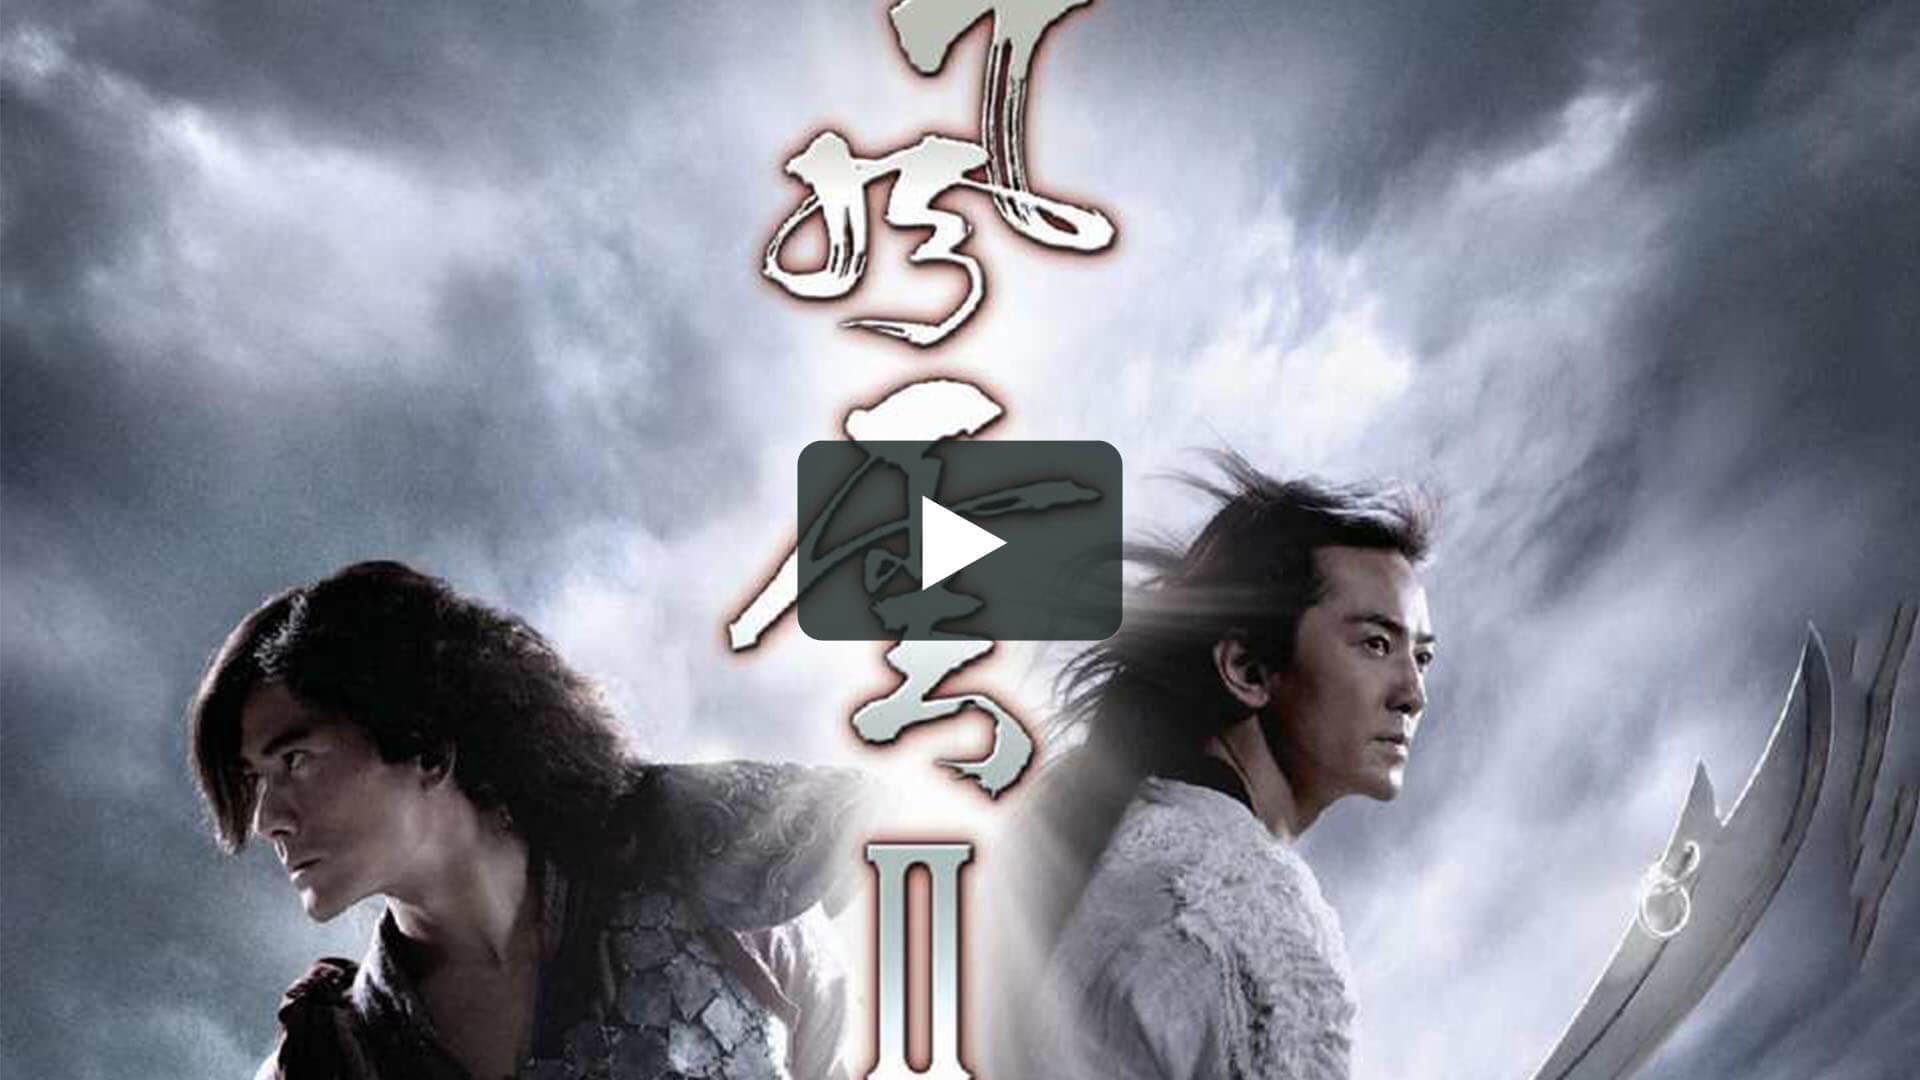 風雲之皇者降臨 2 - The Storm Warriors